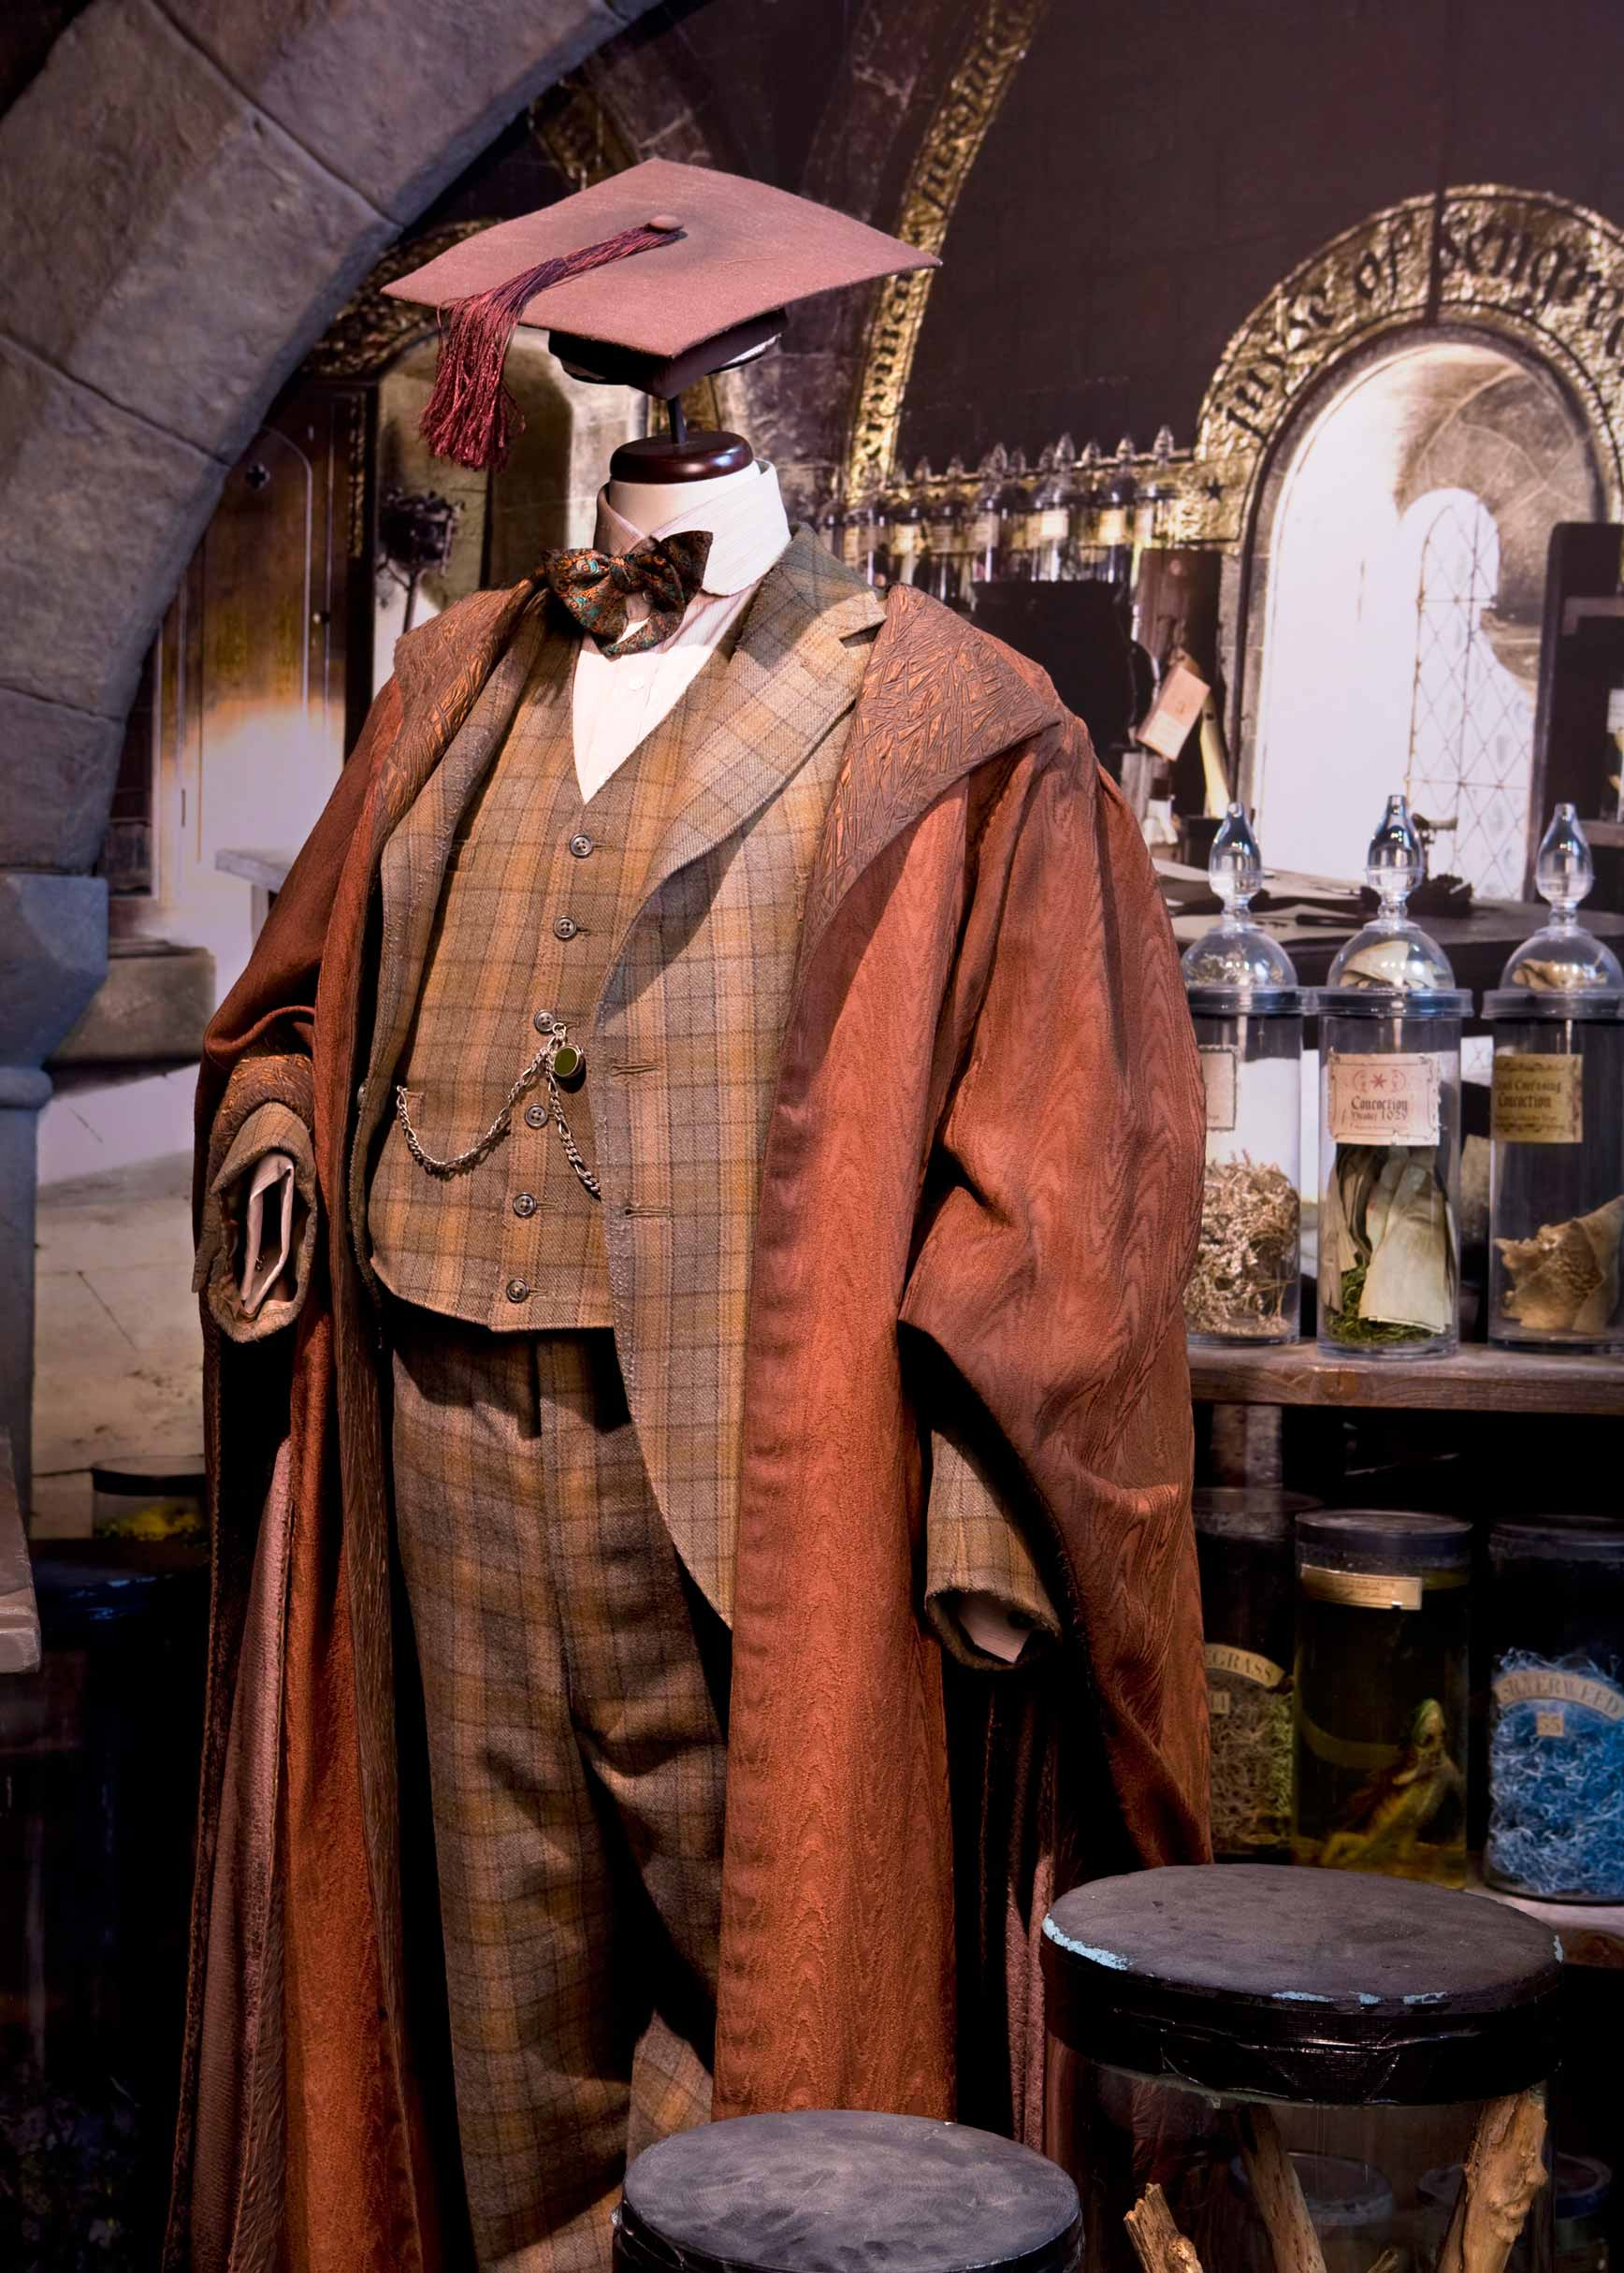 Vestuario-de-Horace-Slughorn-Harry-Potter-The-Exhibition